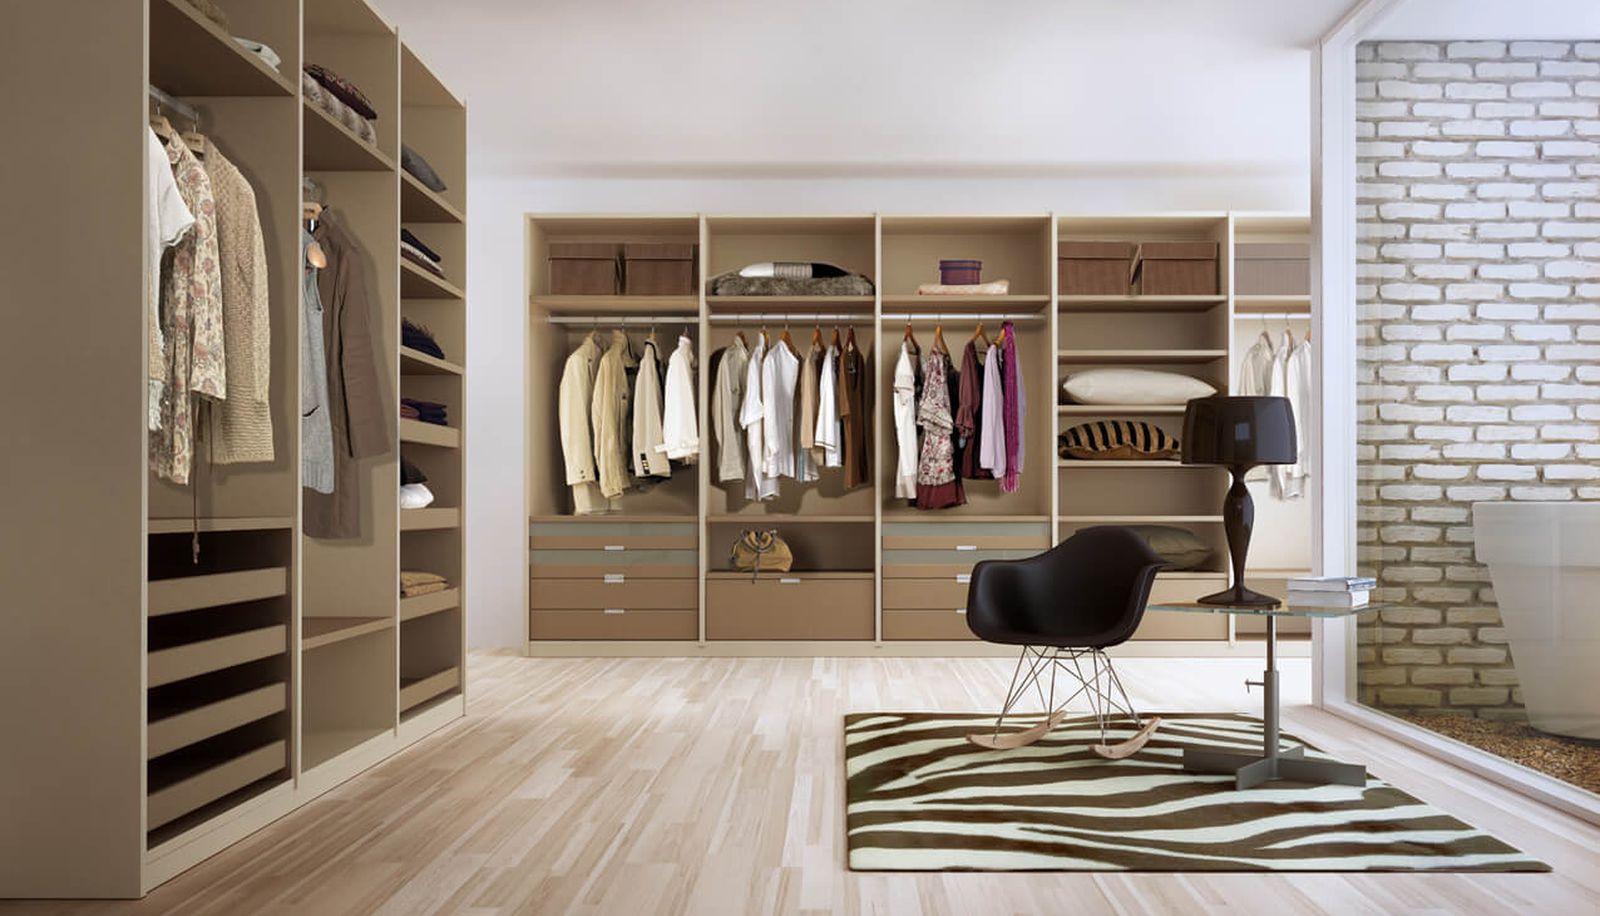 Co Co Espacios Arquitectura De Interiores Muebles De Diseno